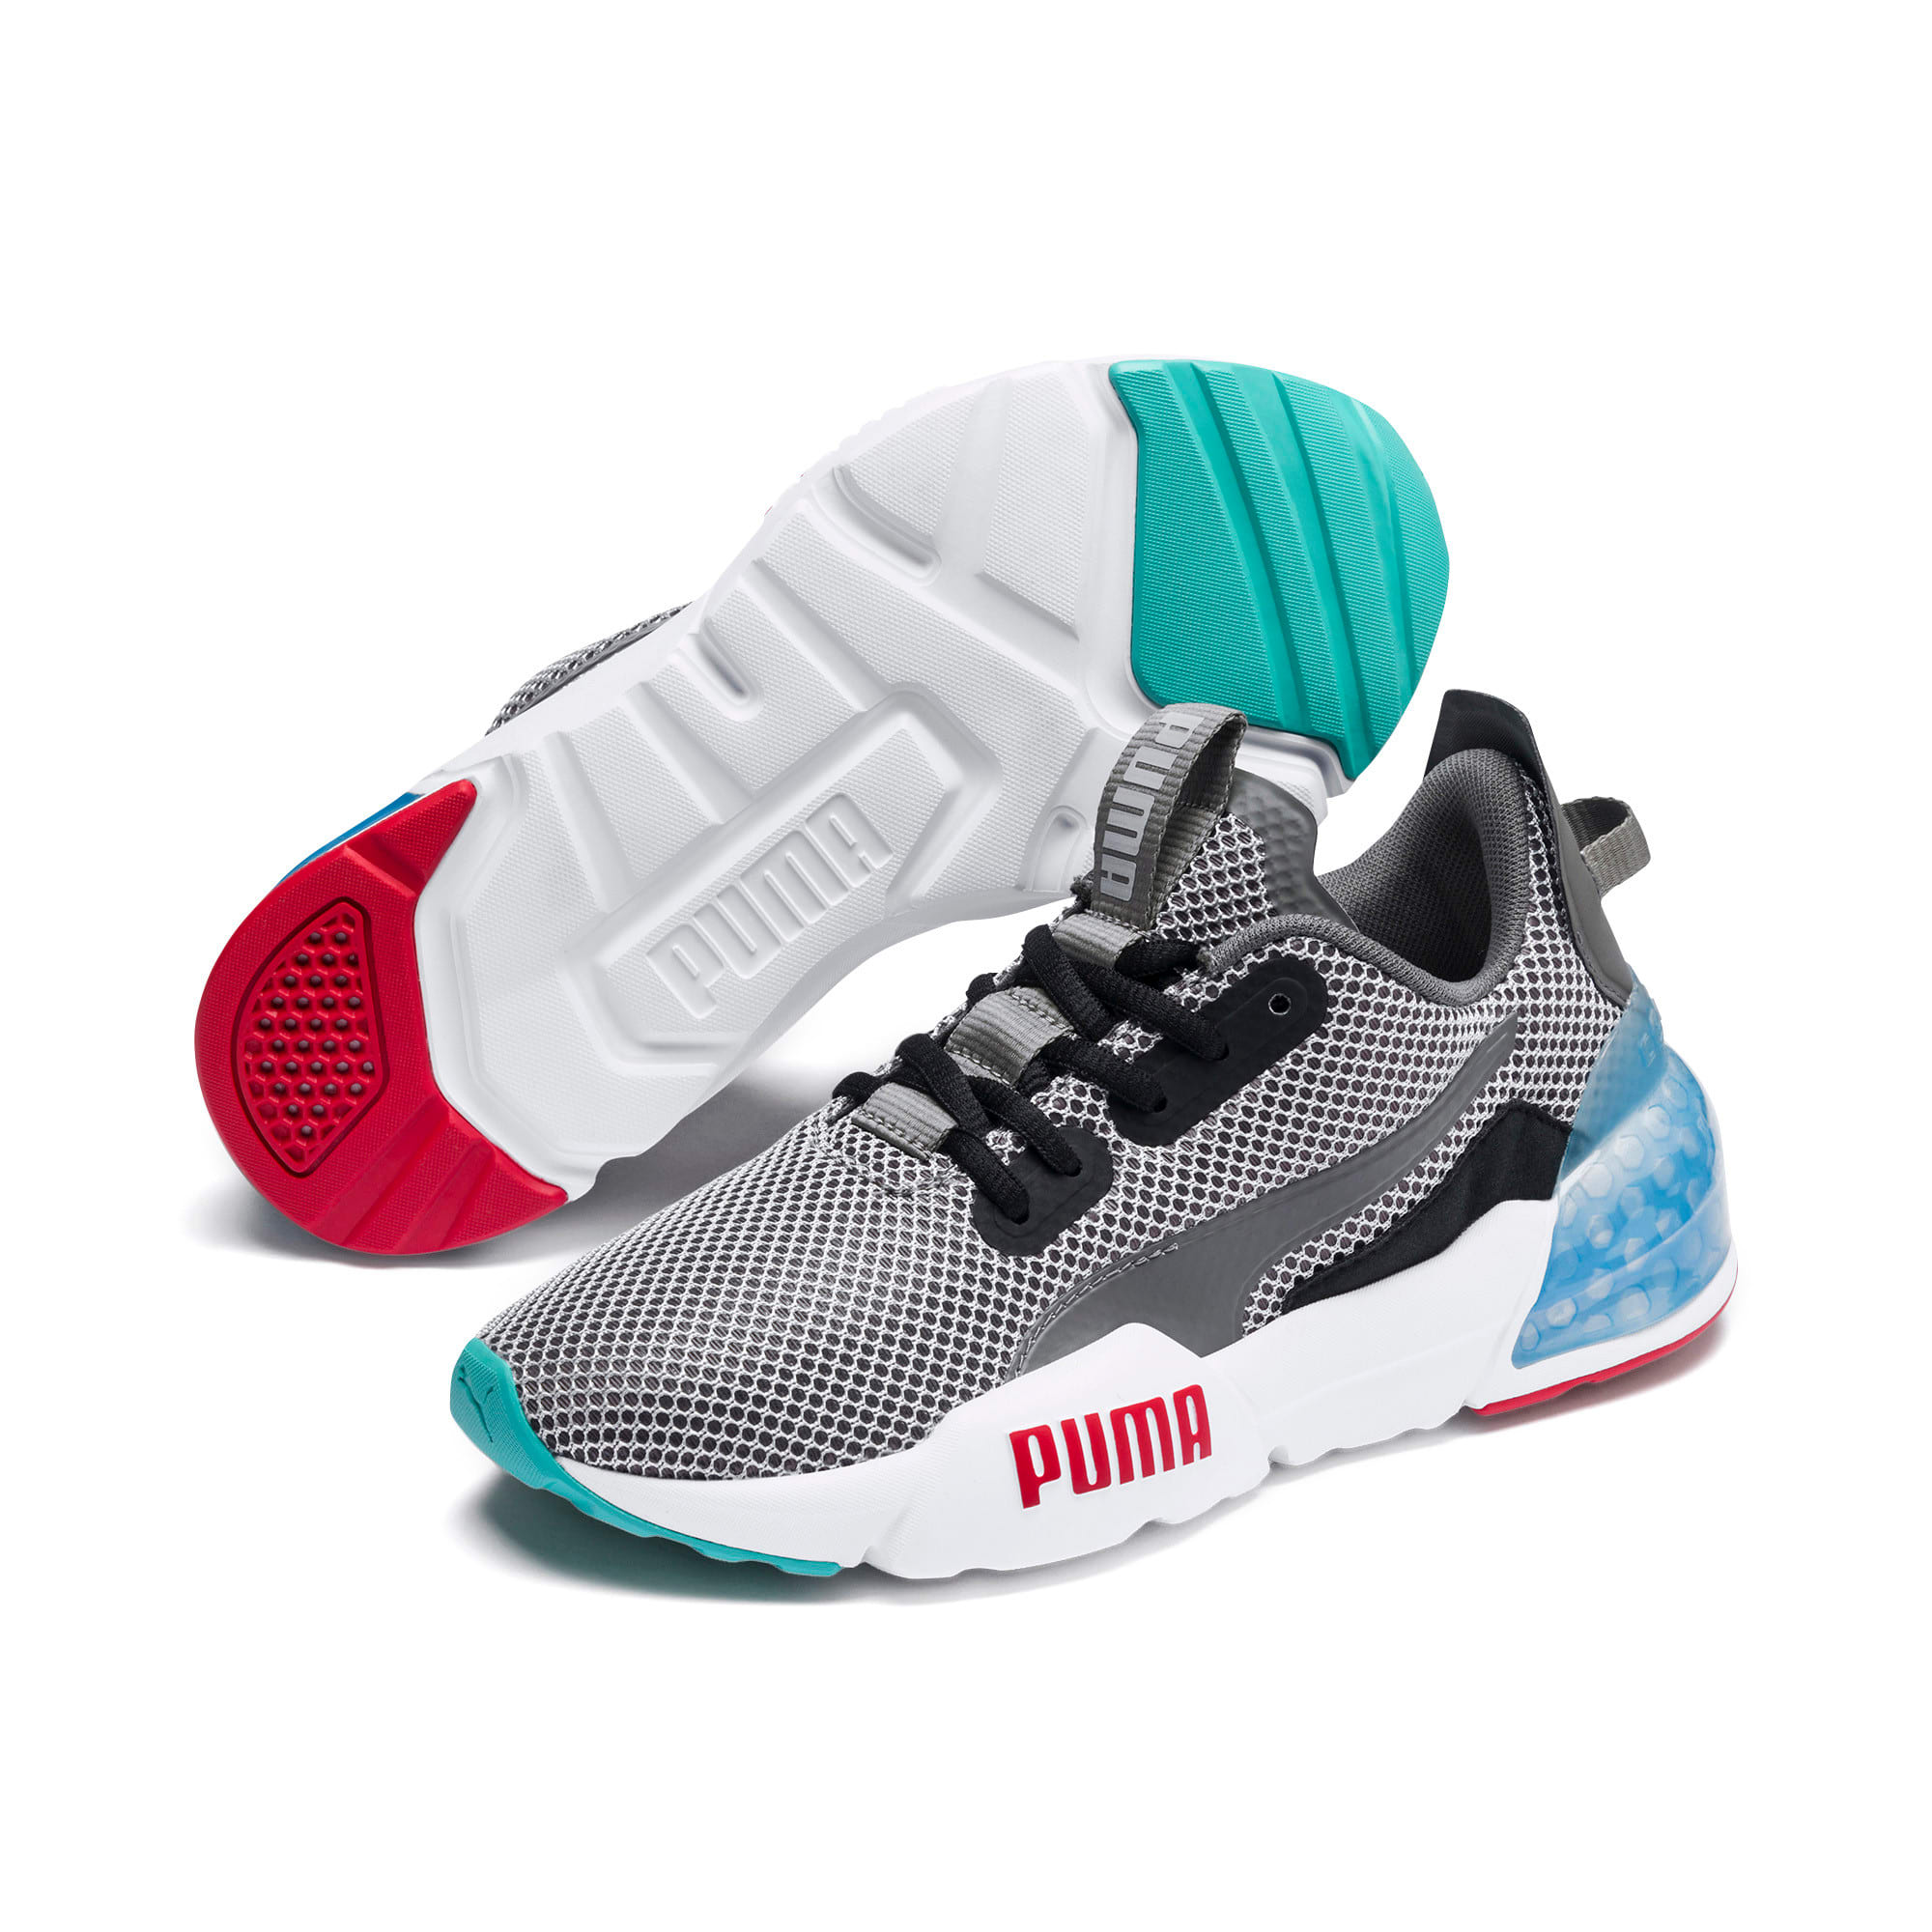 Thumbnail 2 of CELL Phase Sneakers JR, CASTLEROCK-Puma Black, medium